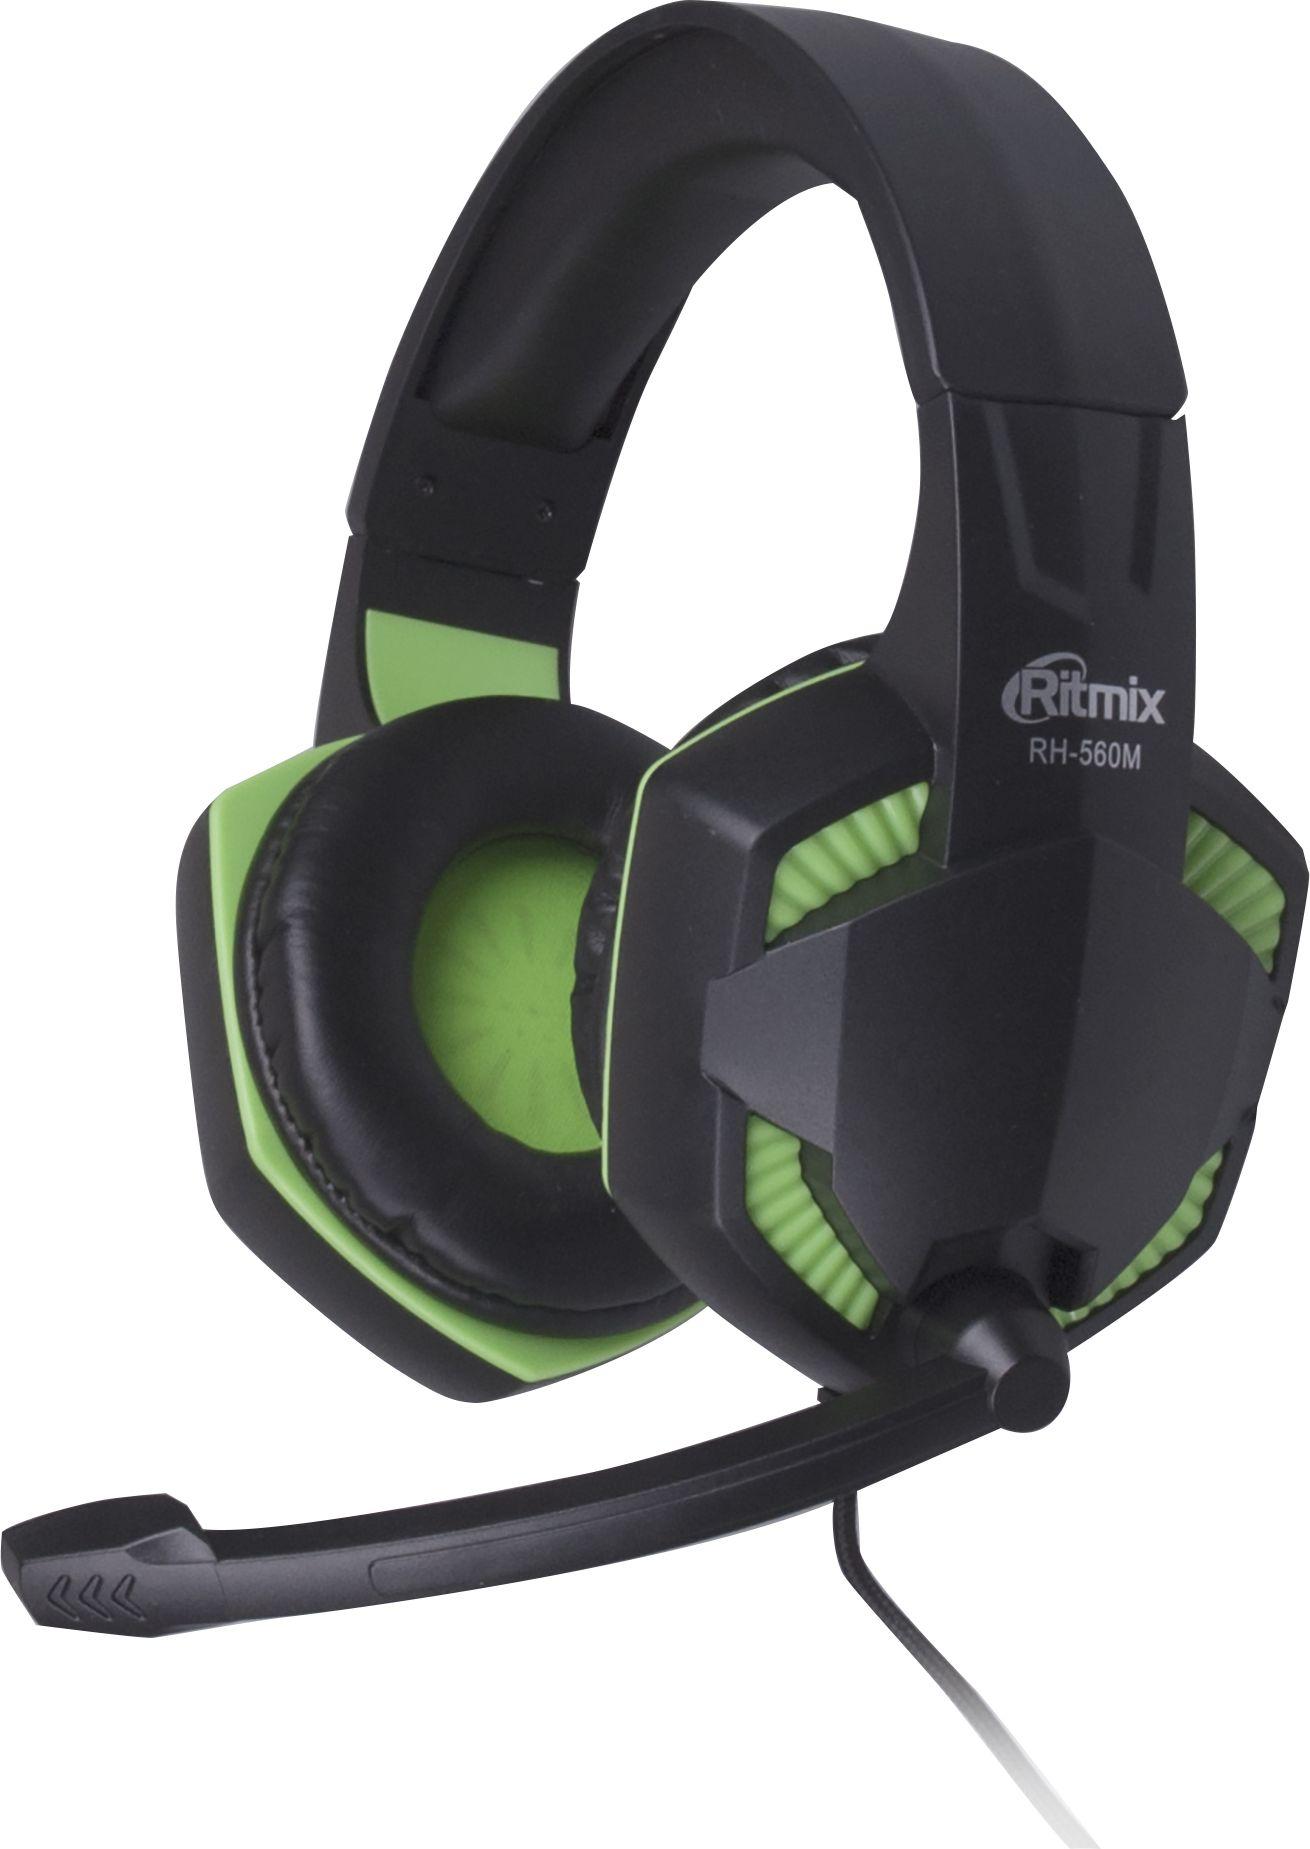 Ritmix RH-560M, Gaming компьютерная гарнитура